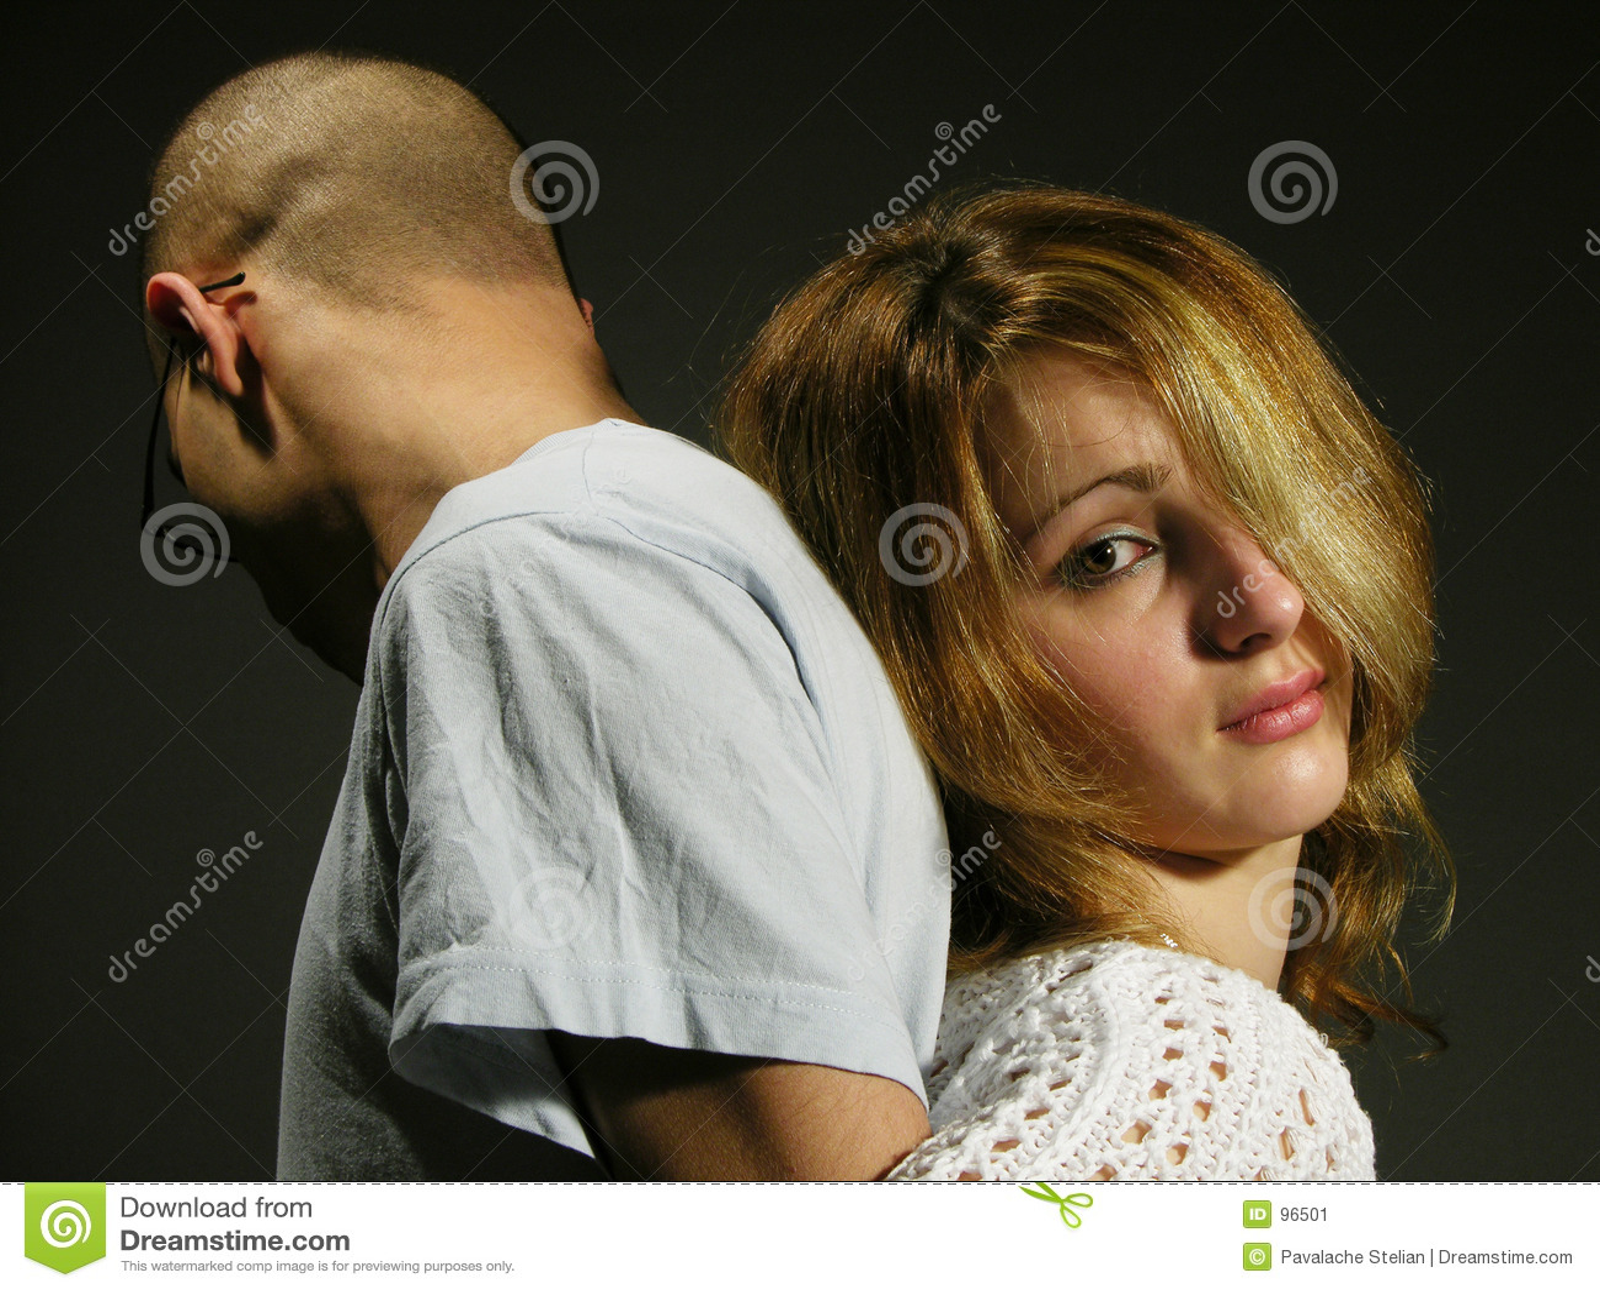 sad couple with young girl and boy 3 stock image image of couple